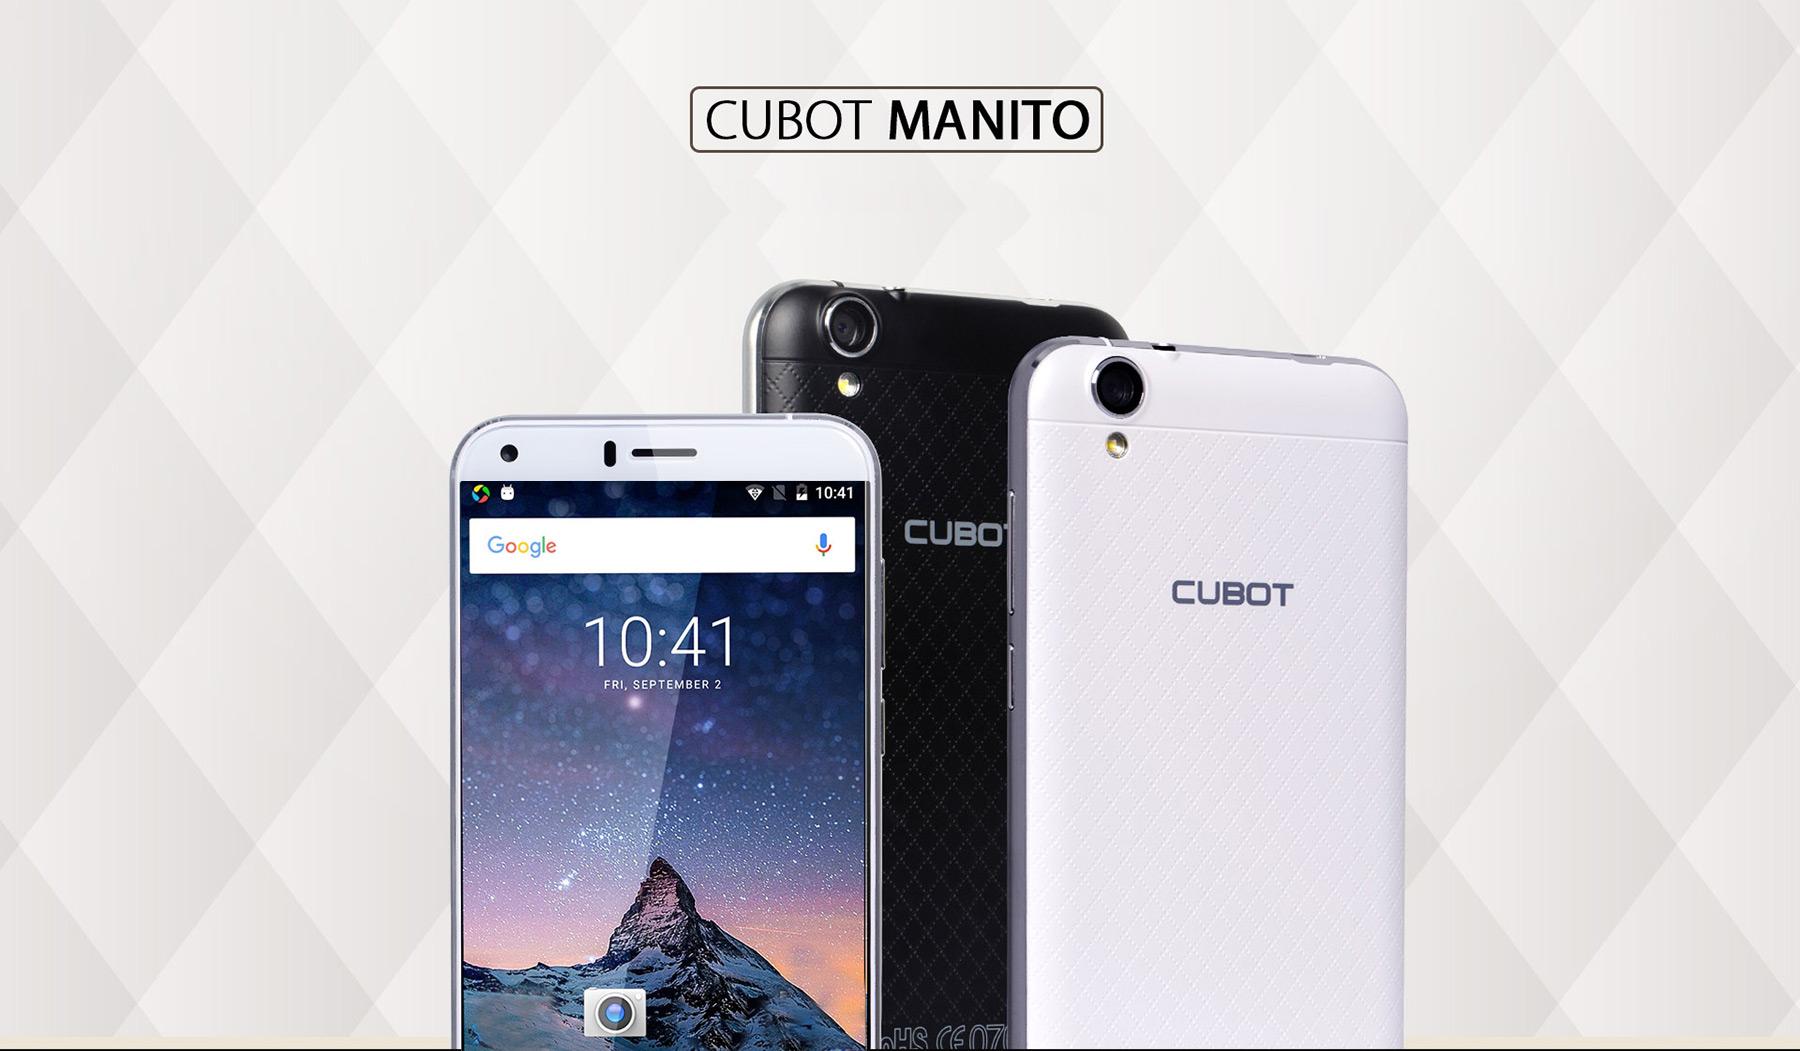 Cubot Manito 4G